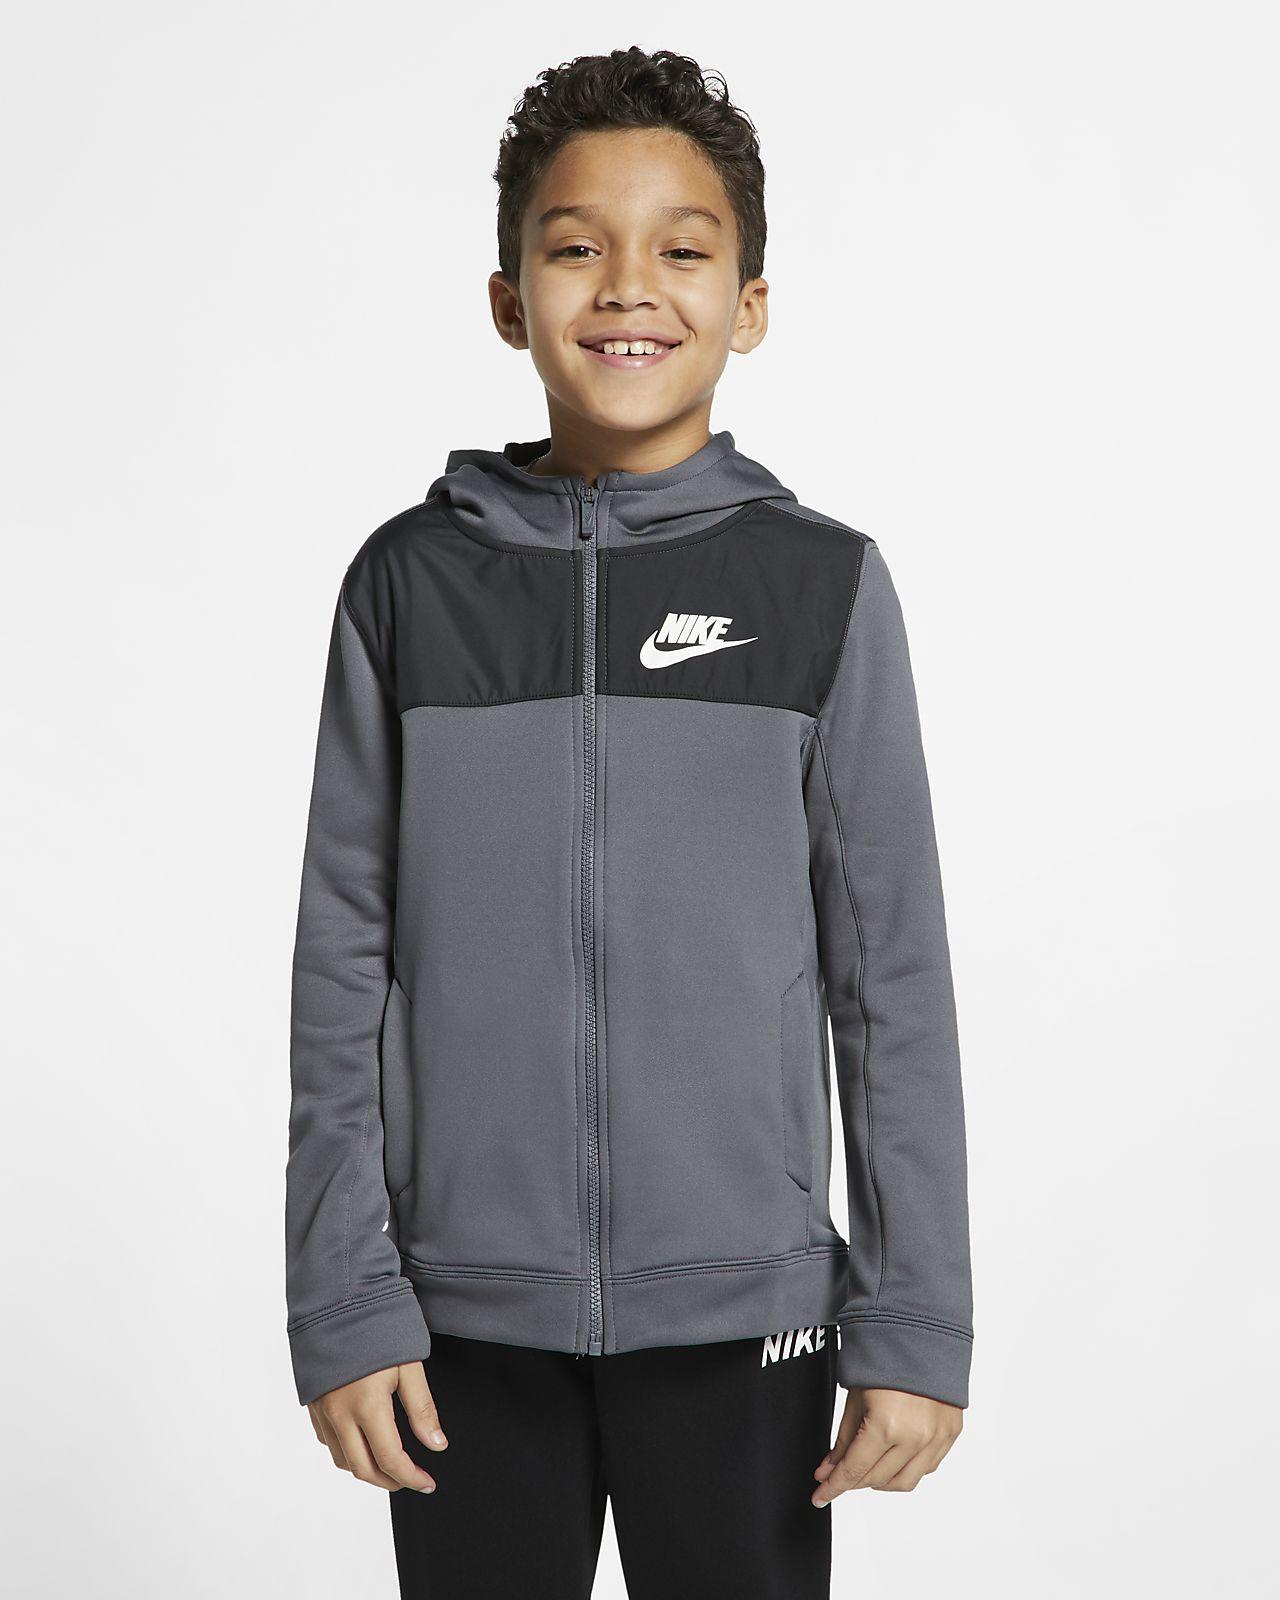 Survêtement Nike Sportswear Advance 15 pour Garçon plus âgé